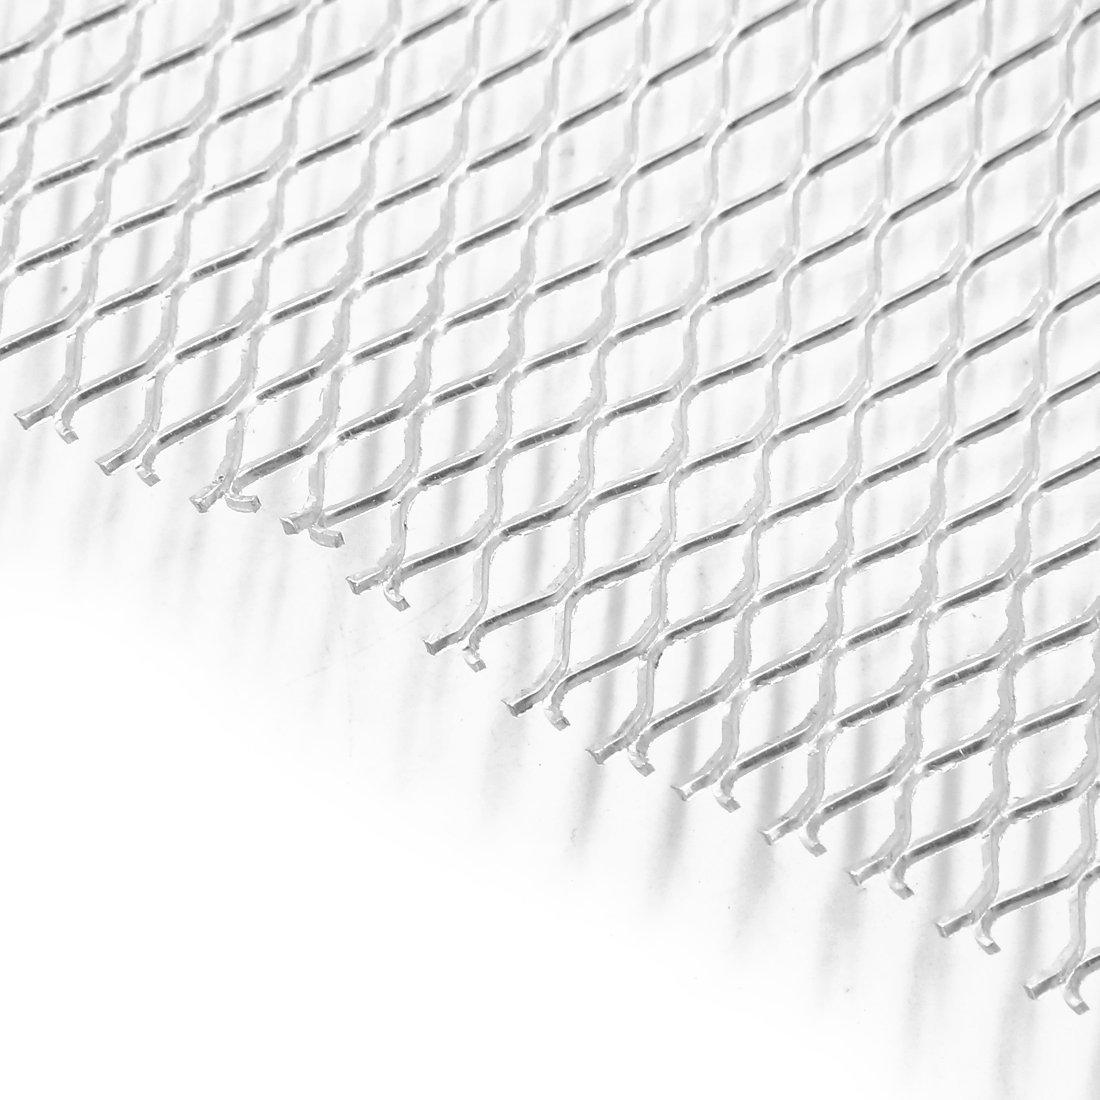 AUTOT 40x13 Car Grille Sheet 25x11mm Hexagon Type Silver